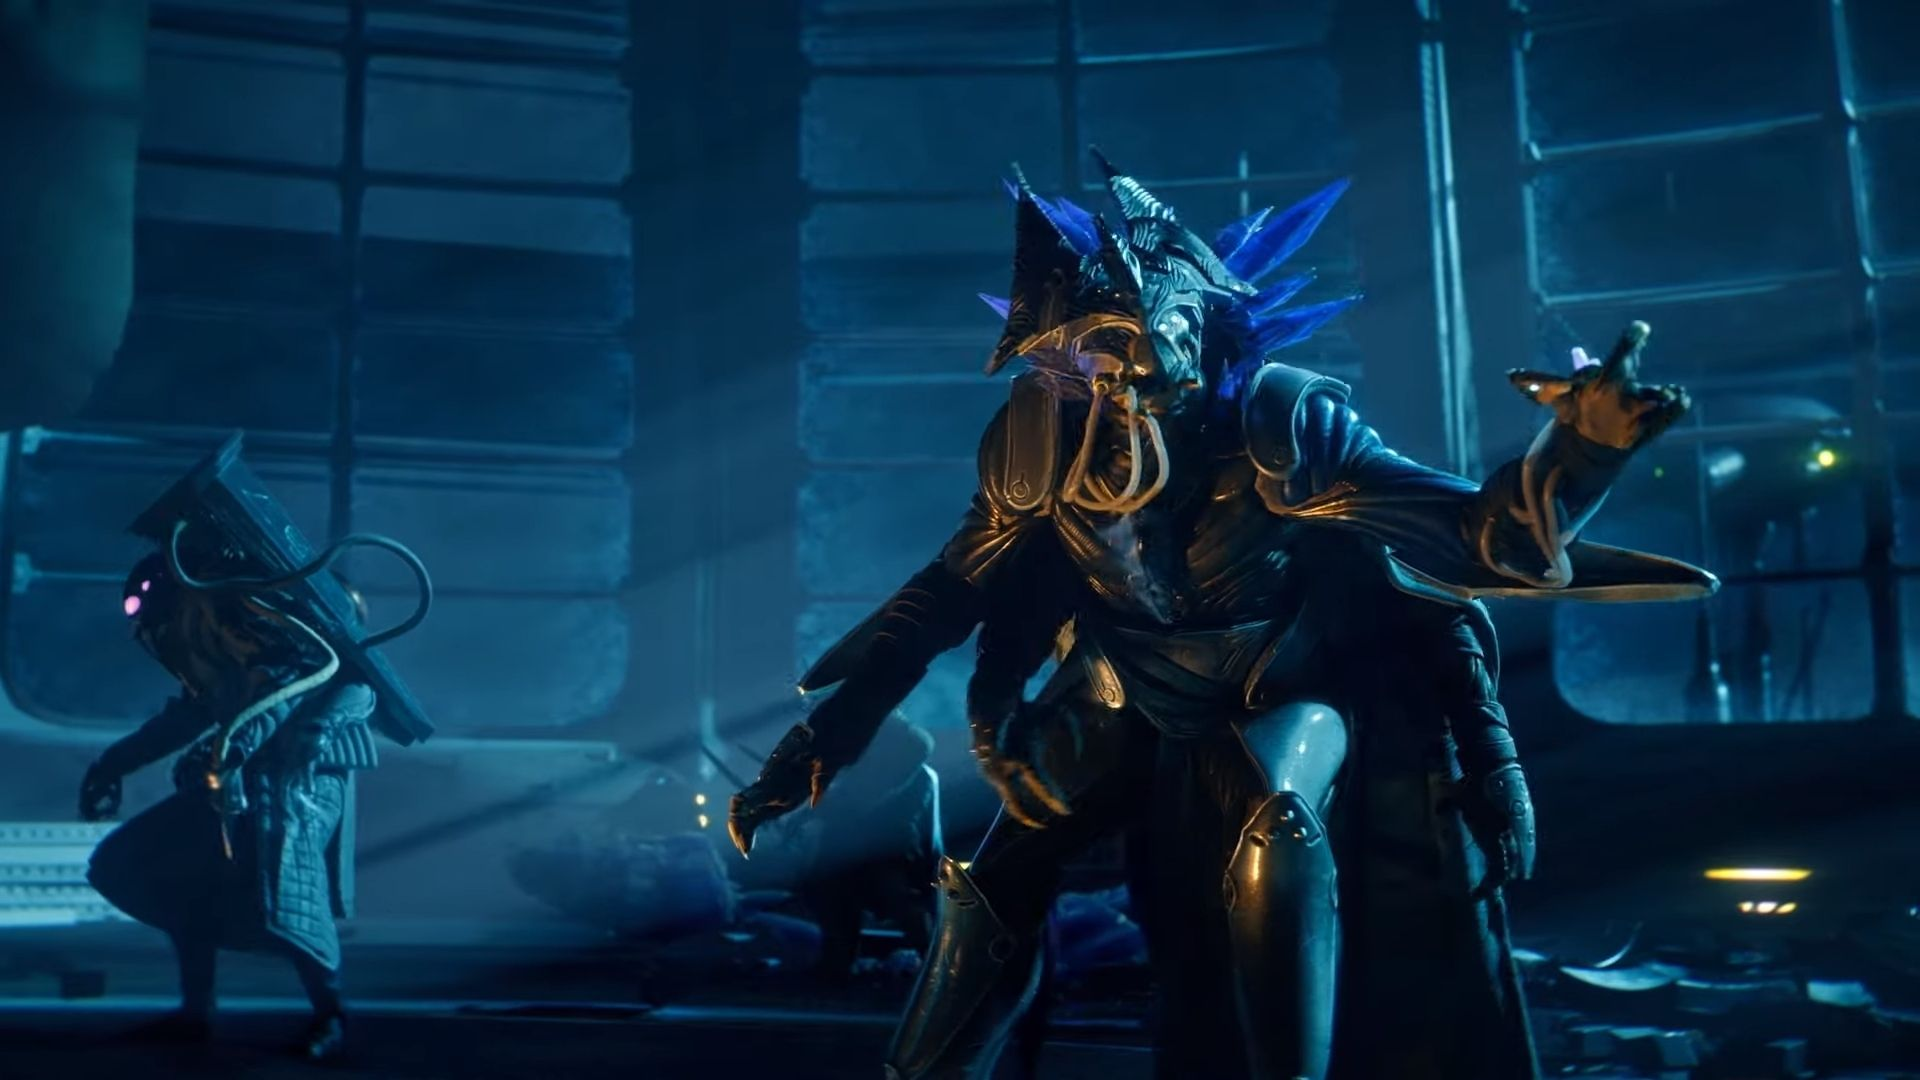 Eramis in Destiny 2 beyond light